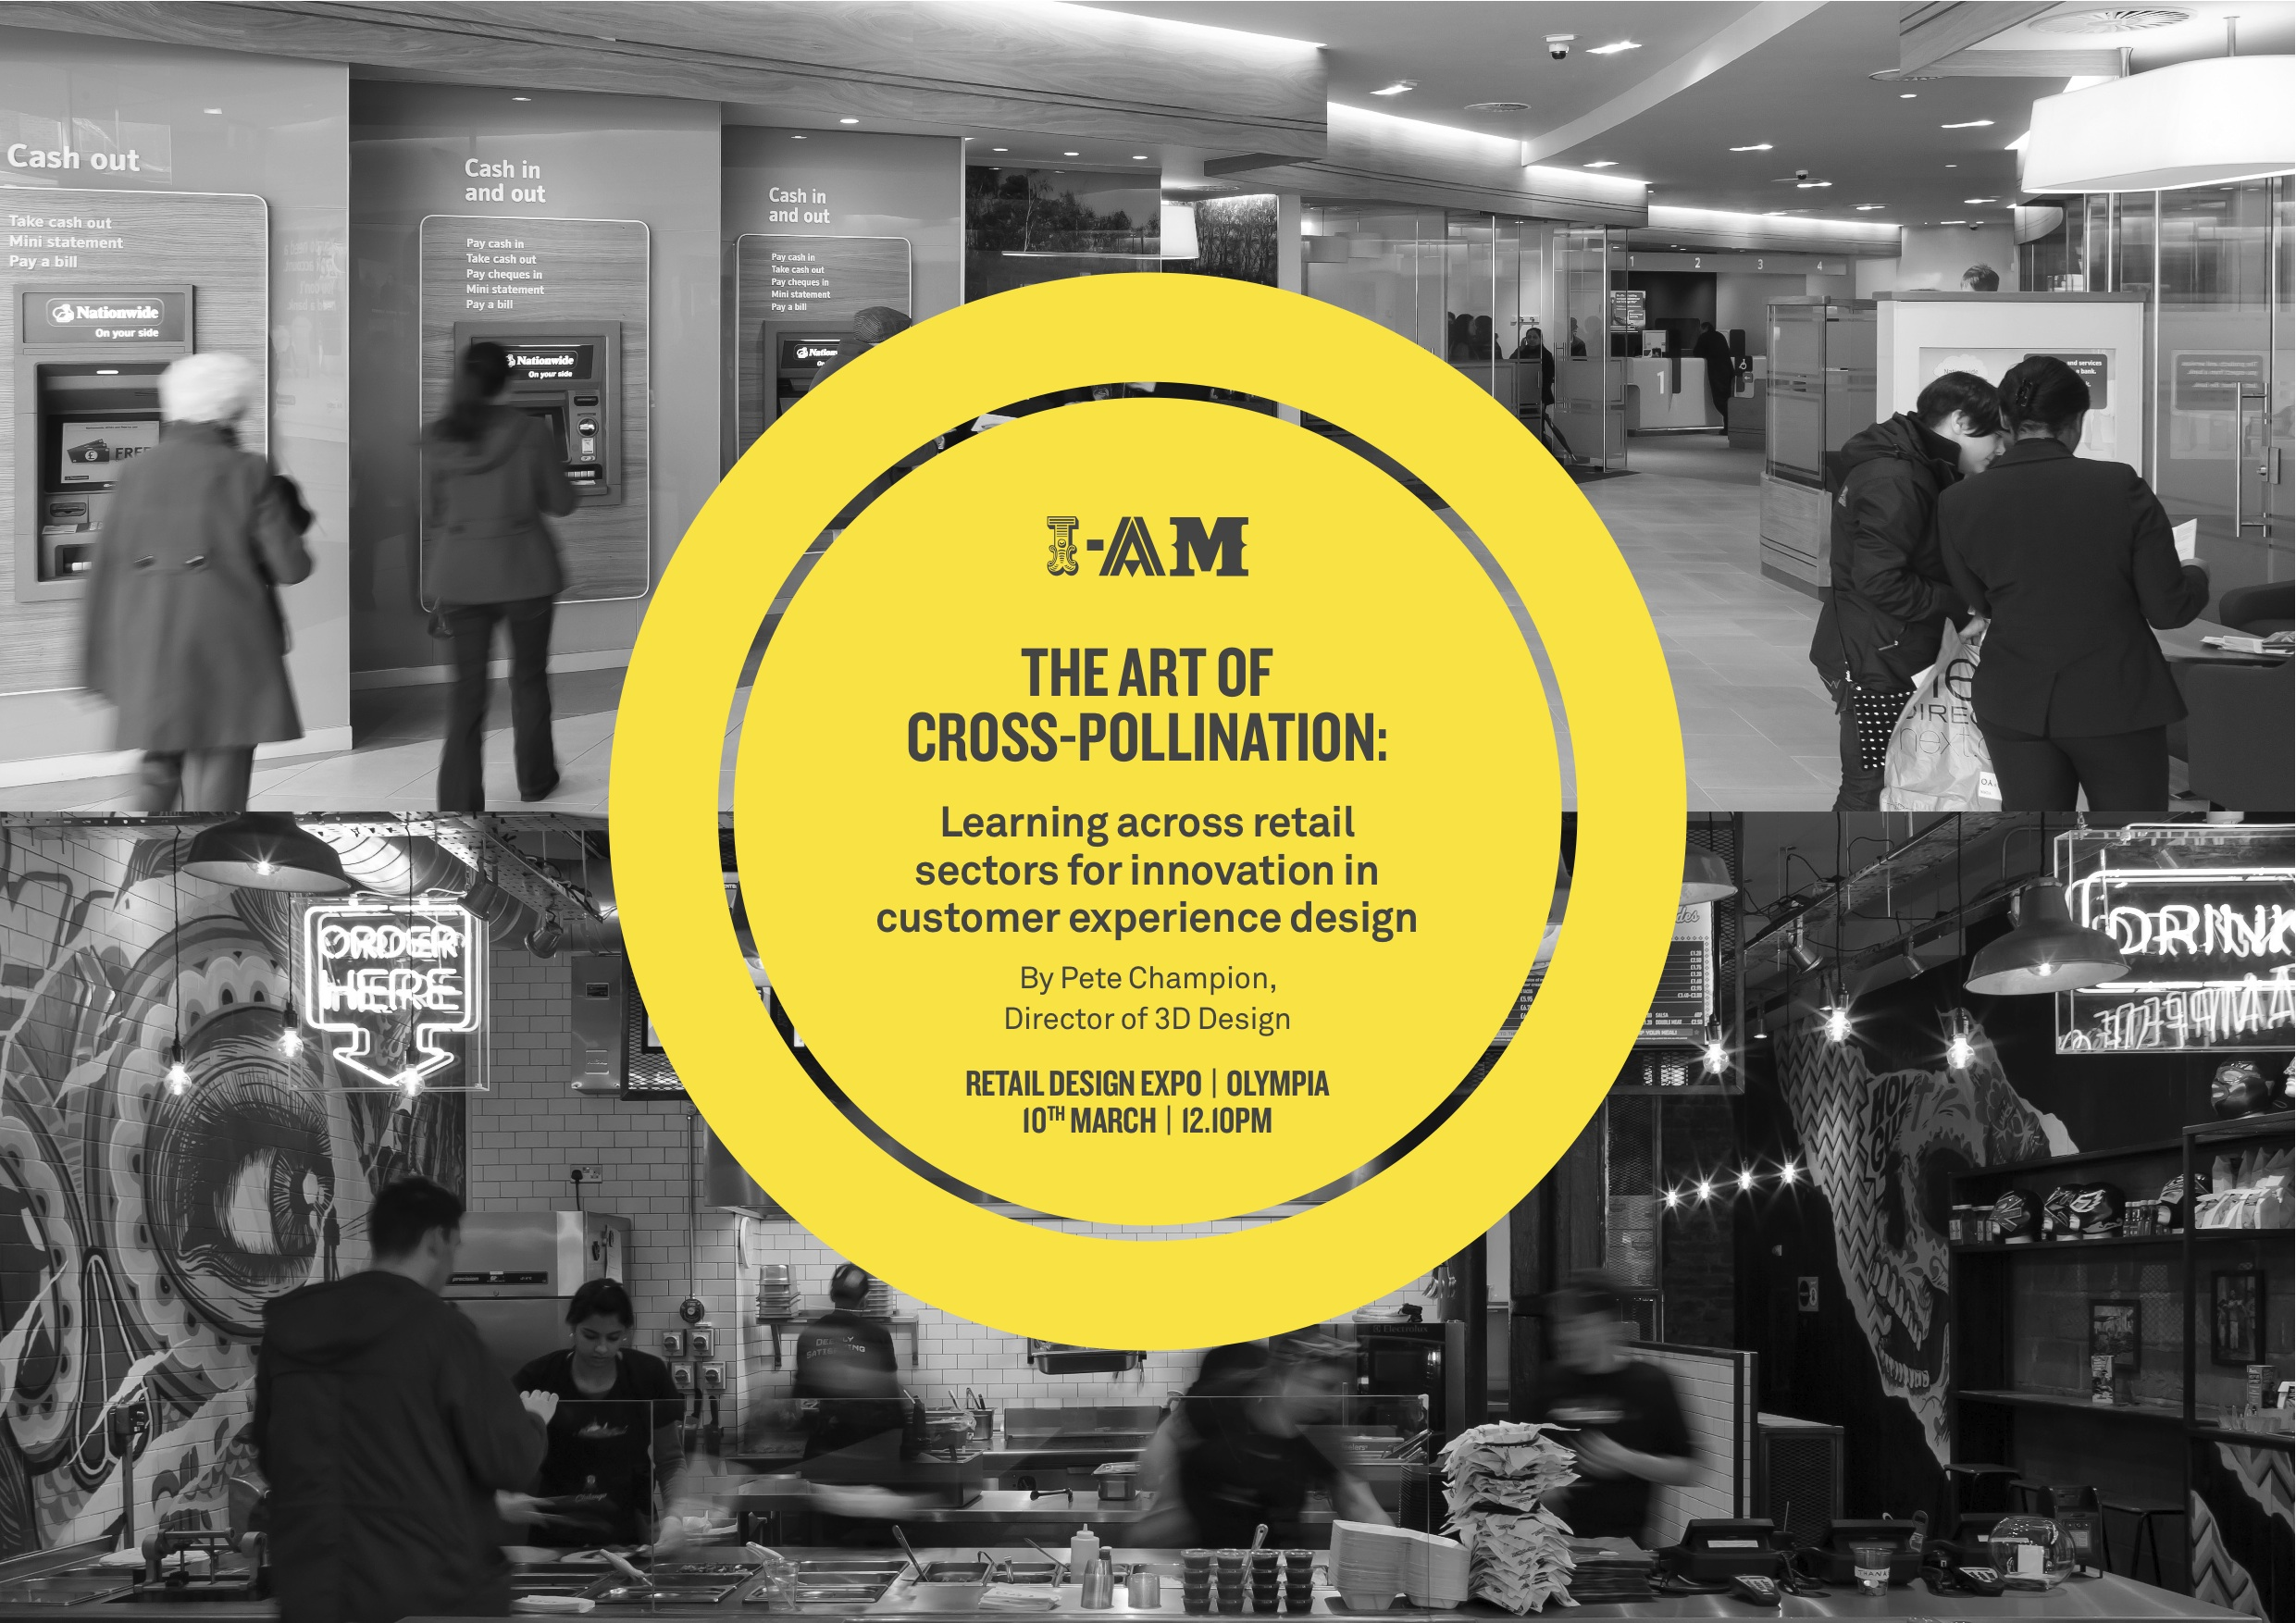 I-AM present at Retail Design Expo